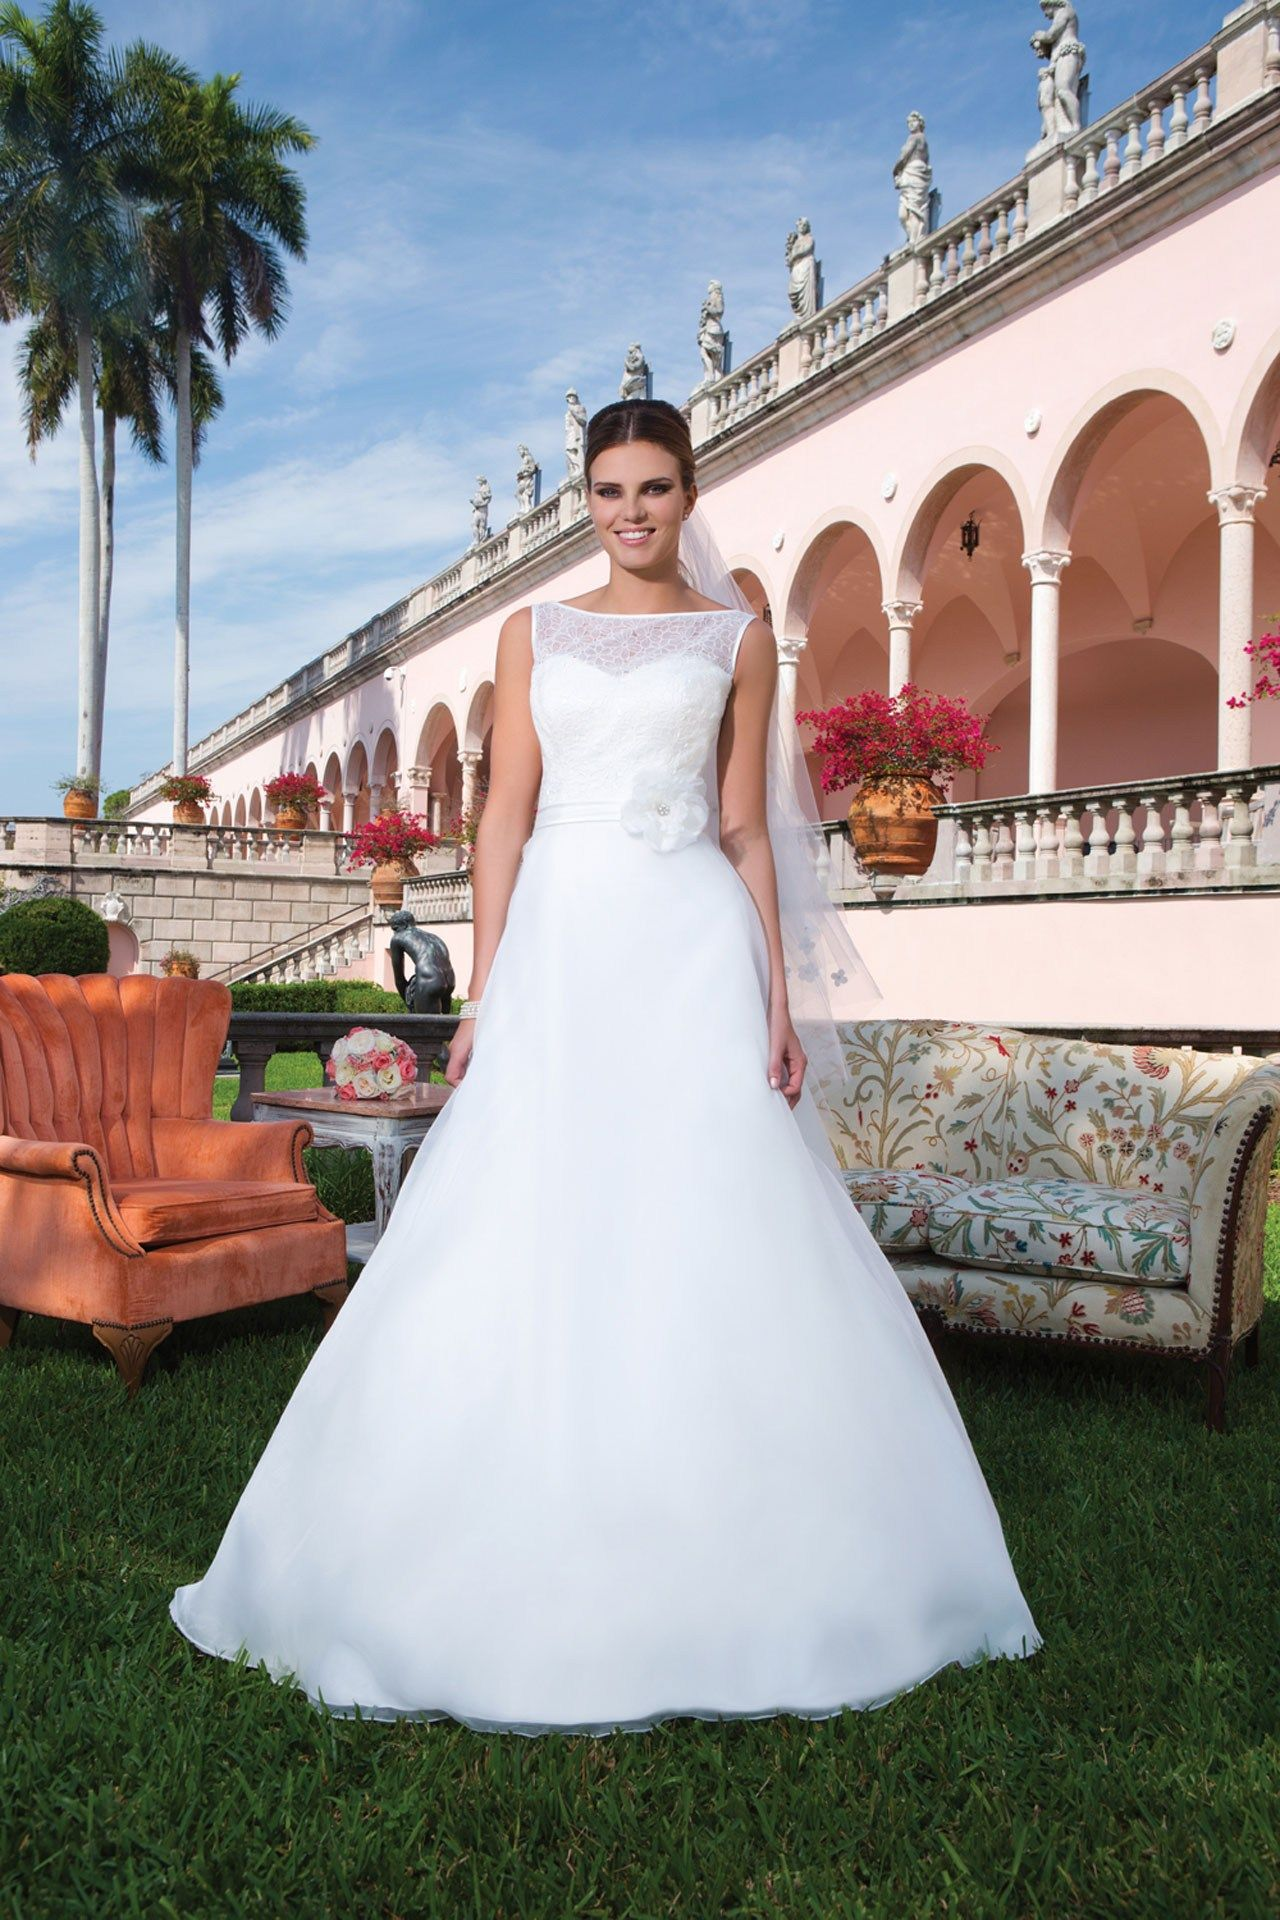 Wedding dress inspiration ideas for wedding dresses UK